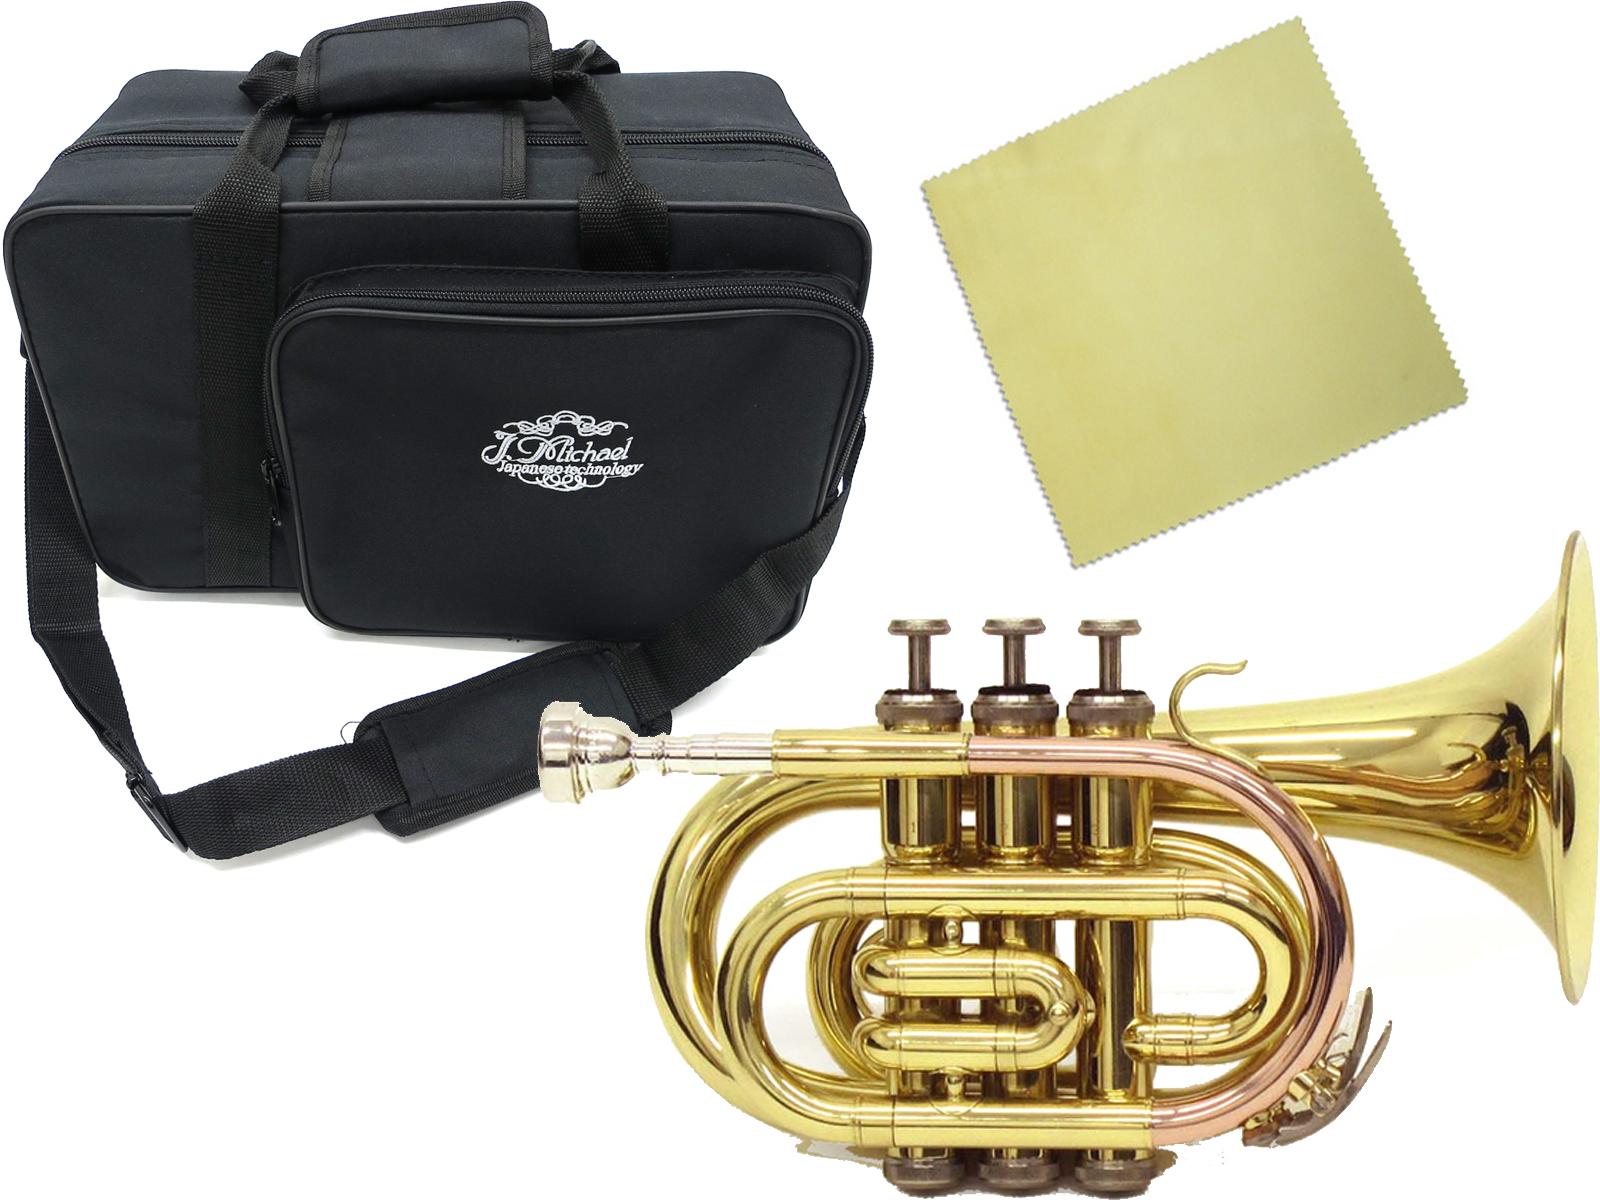 J Michael ( Jマイケル ) TR-350PL ポケットトランペット 新品 アウトレット 新品 ミニ トランペット ゴールド 管楽器 mini pocket trumpet gold TR350PL